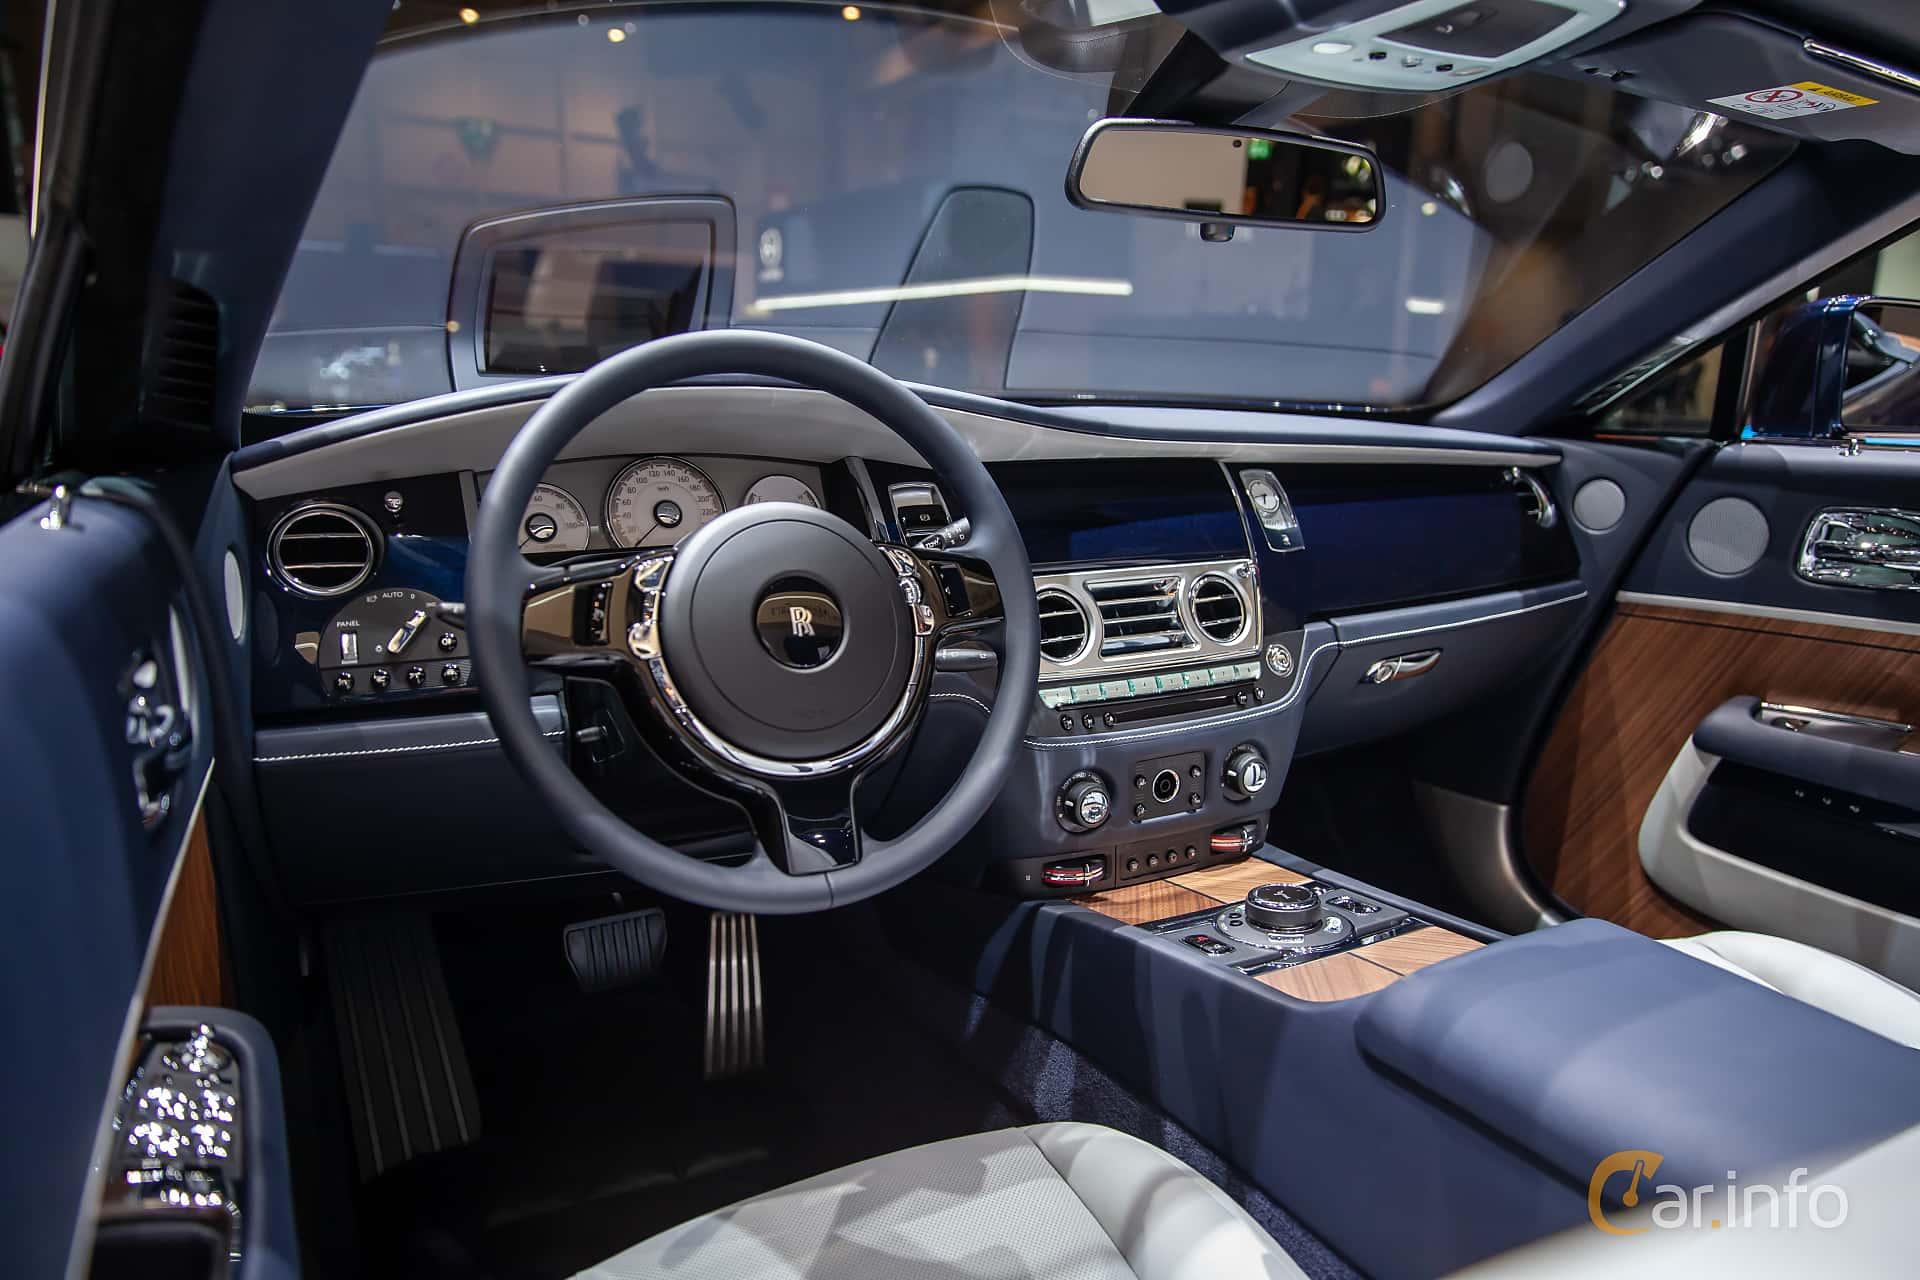 Rolls-Royce Dawn 6.6 V12 Automatic, 570hp, 2019 at Geneva Motor Show 2019